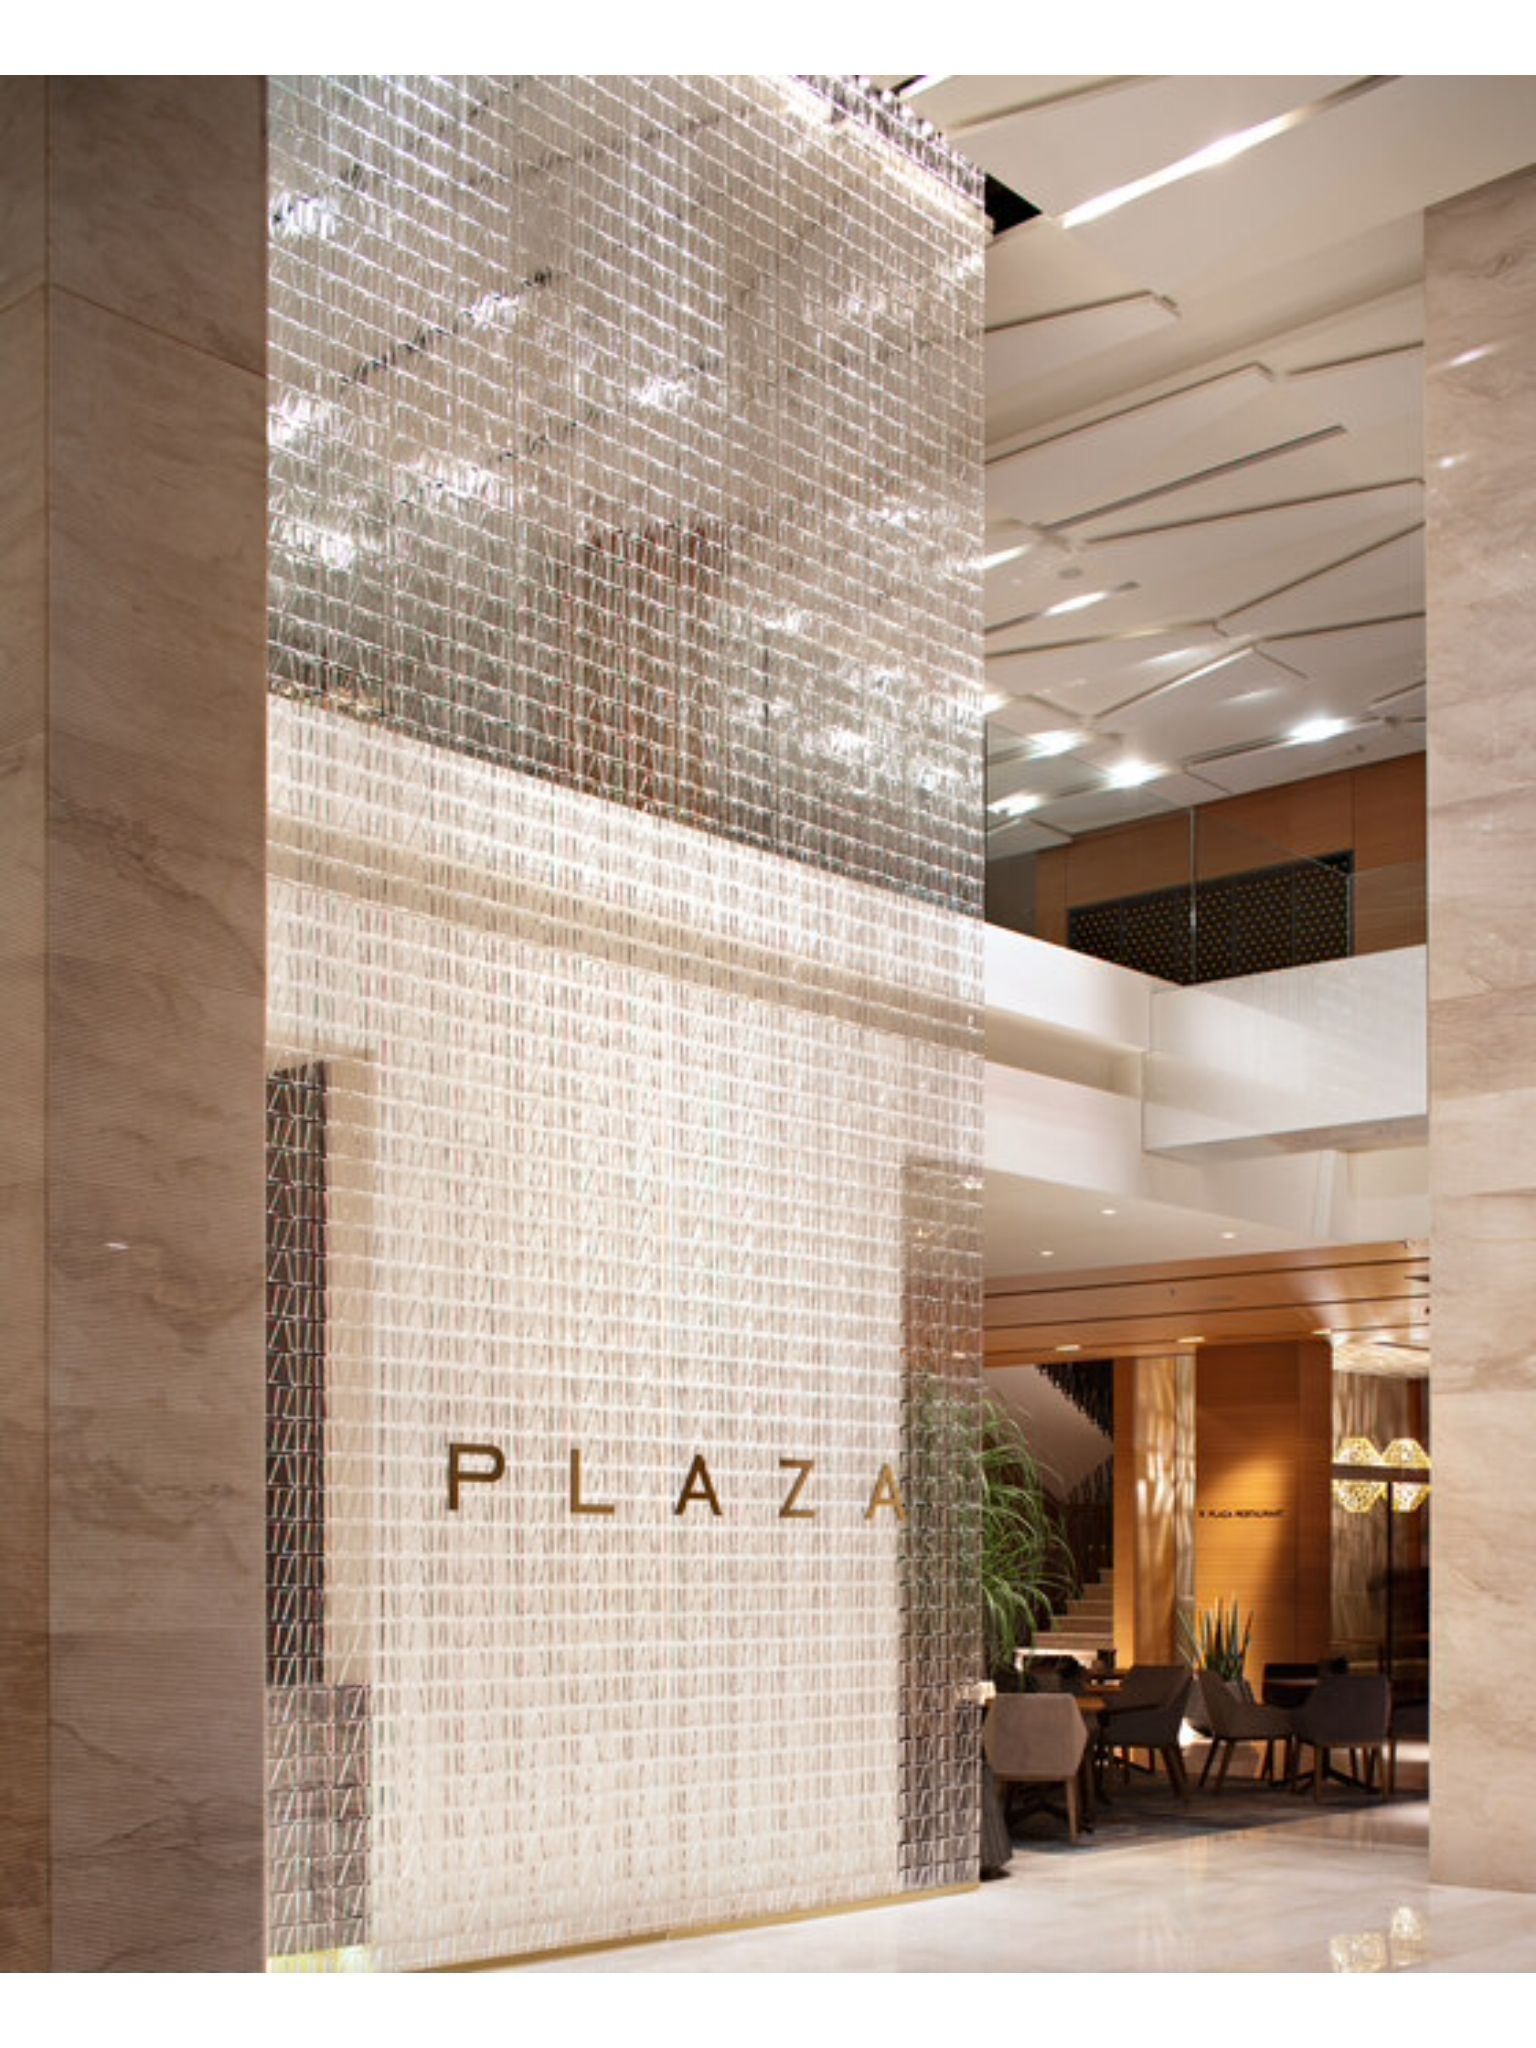 Fabbian illuminazione spa | Lighting Elements | Restaurant lighting ...